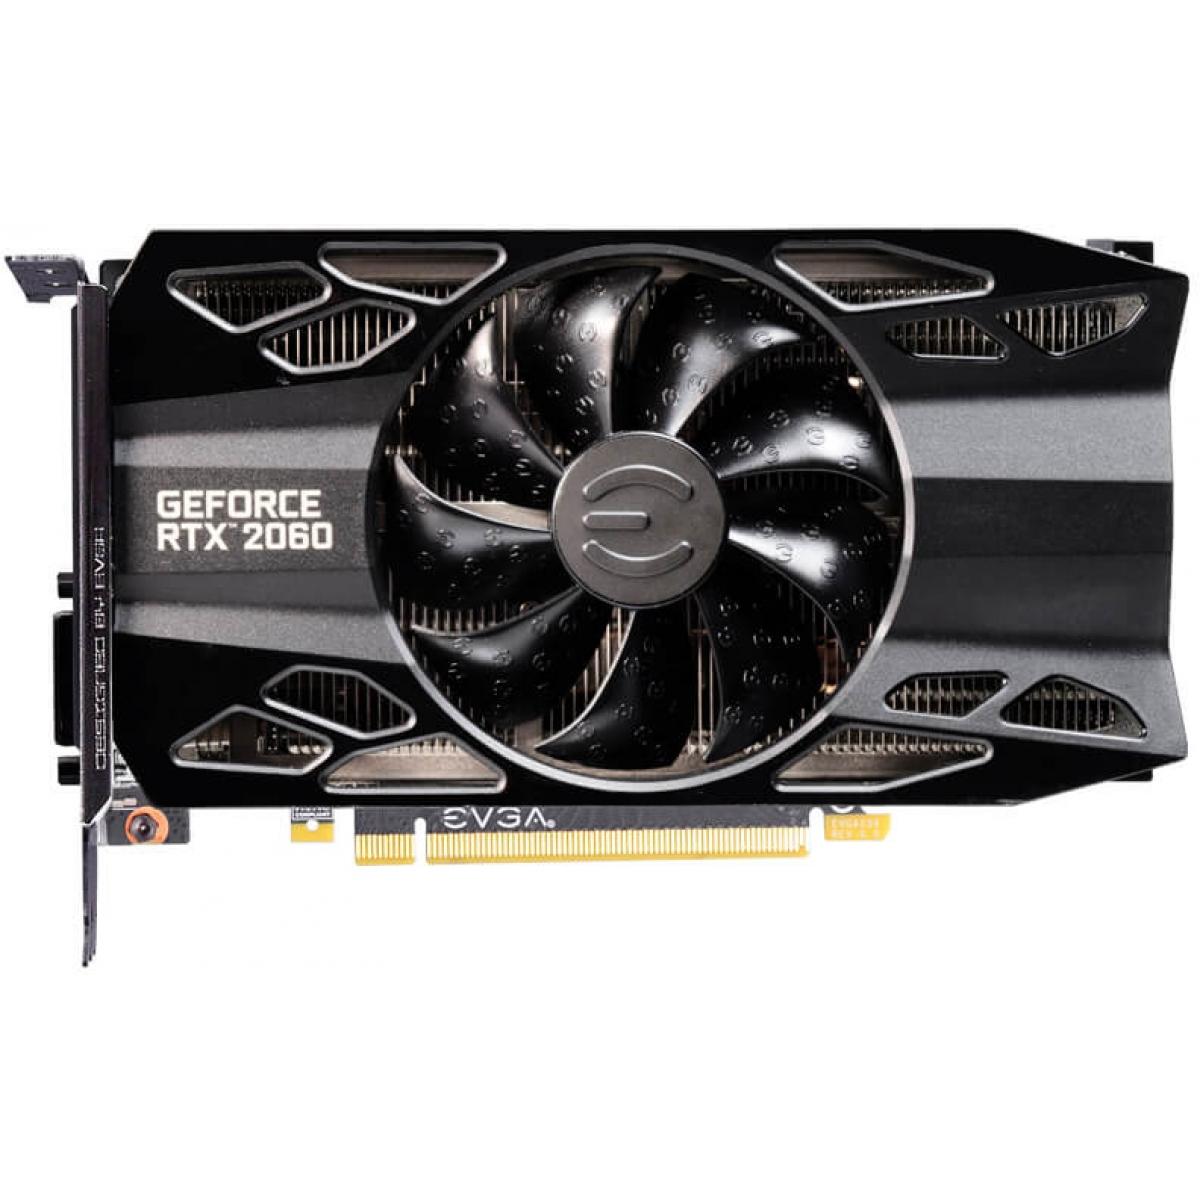 Placa de Vídeo EVGA GeForce RTX 2060 XC, 6GB, GDDR6, 192bit, 06G-P4-2063-KR